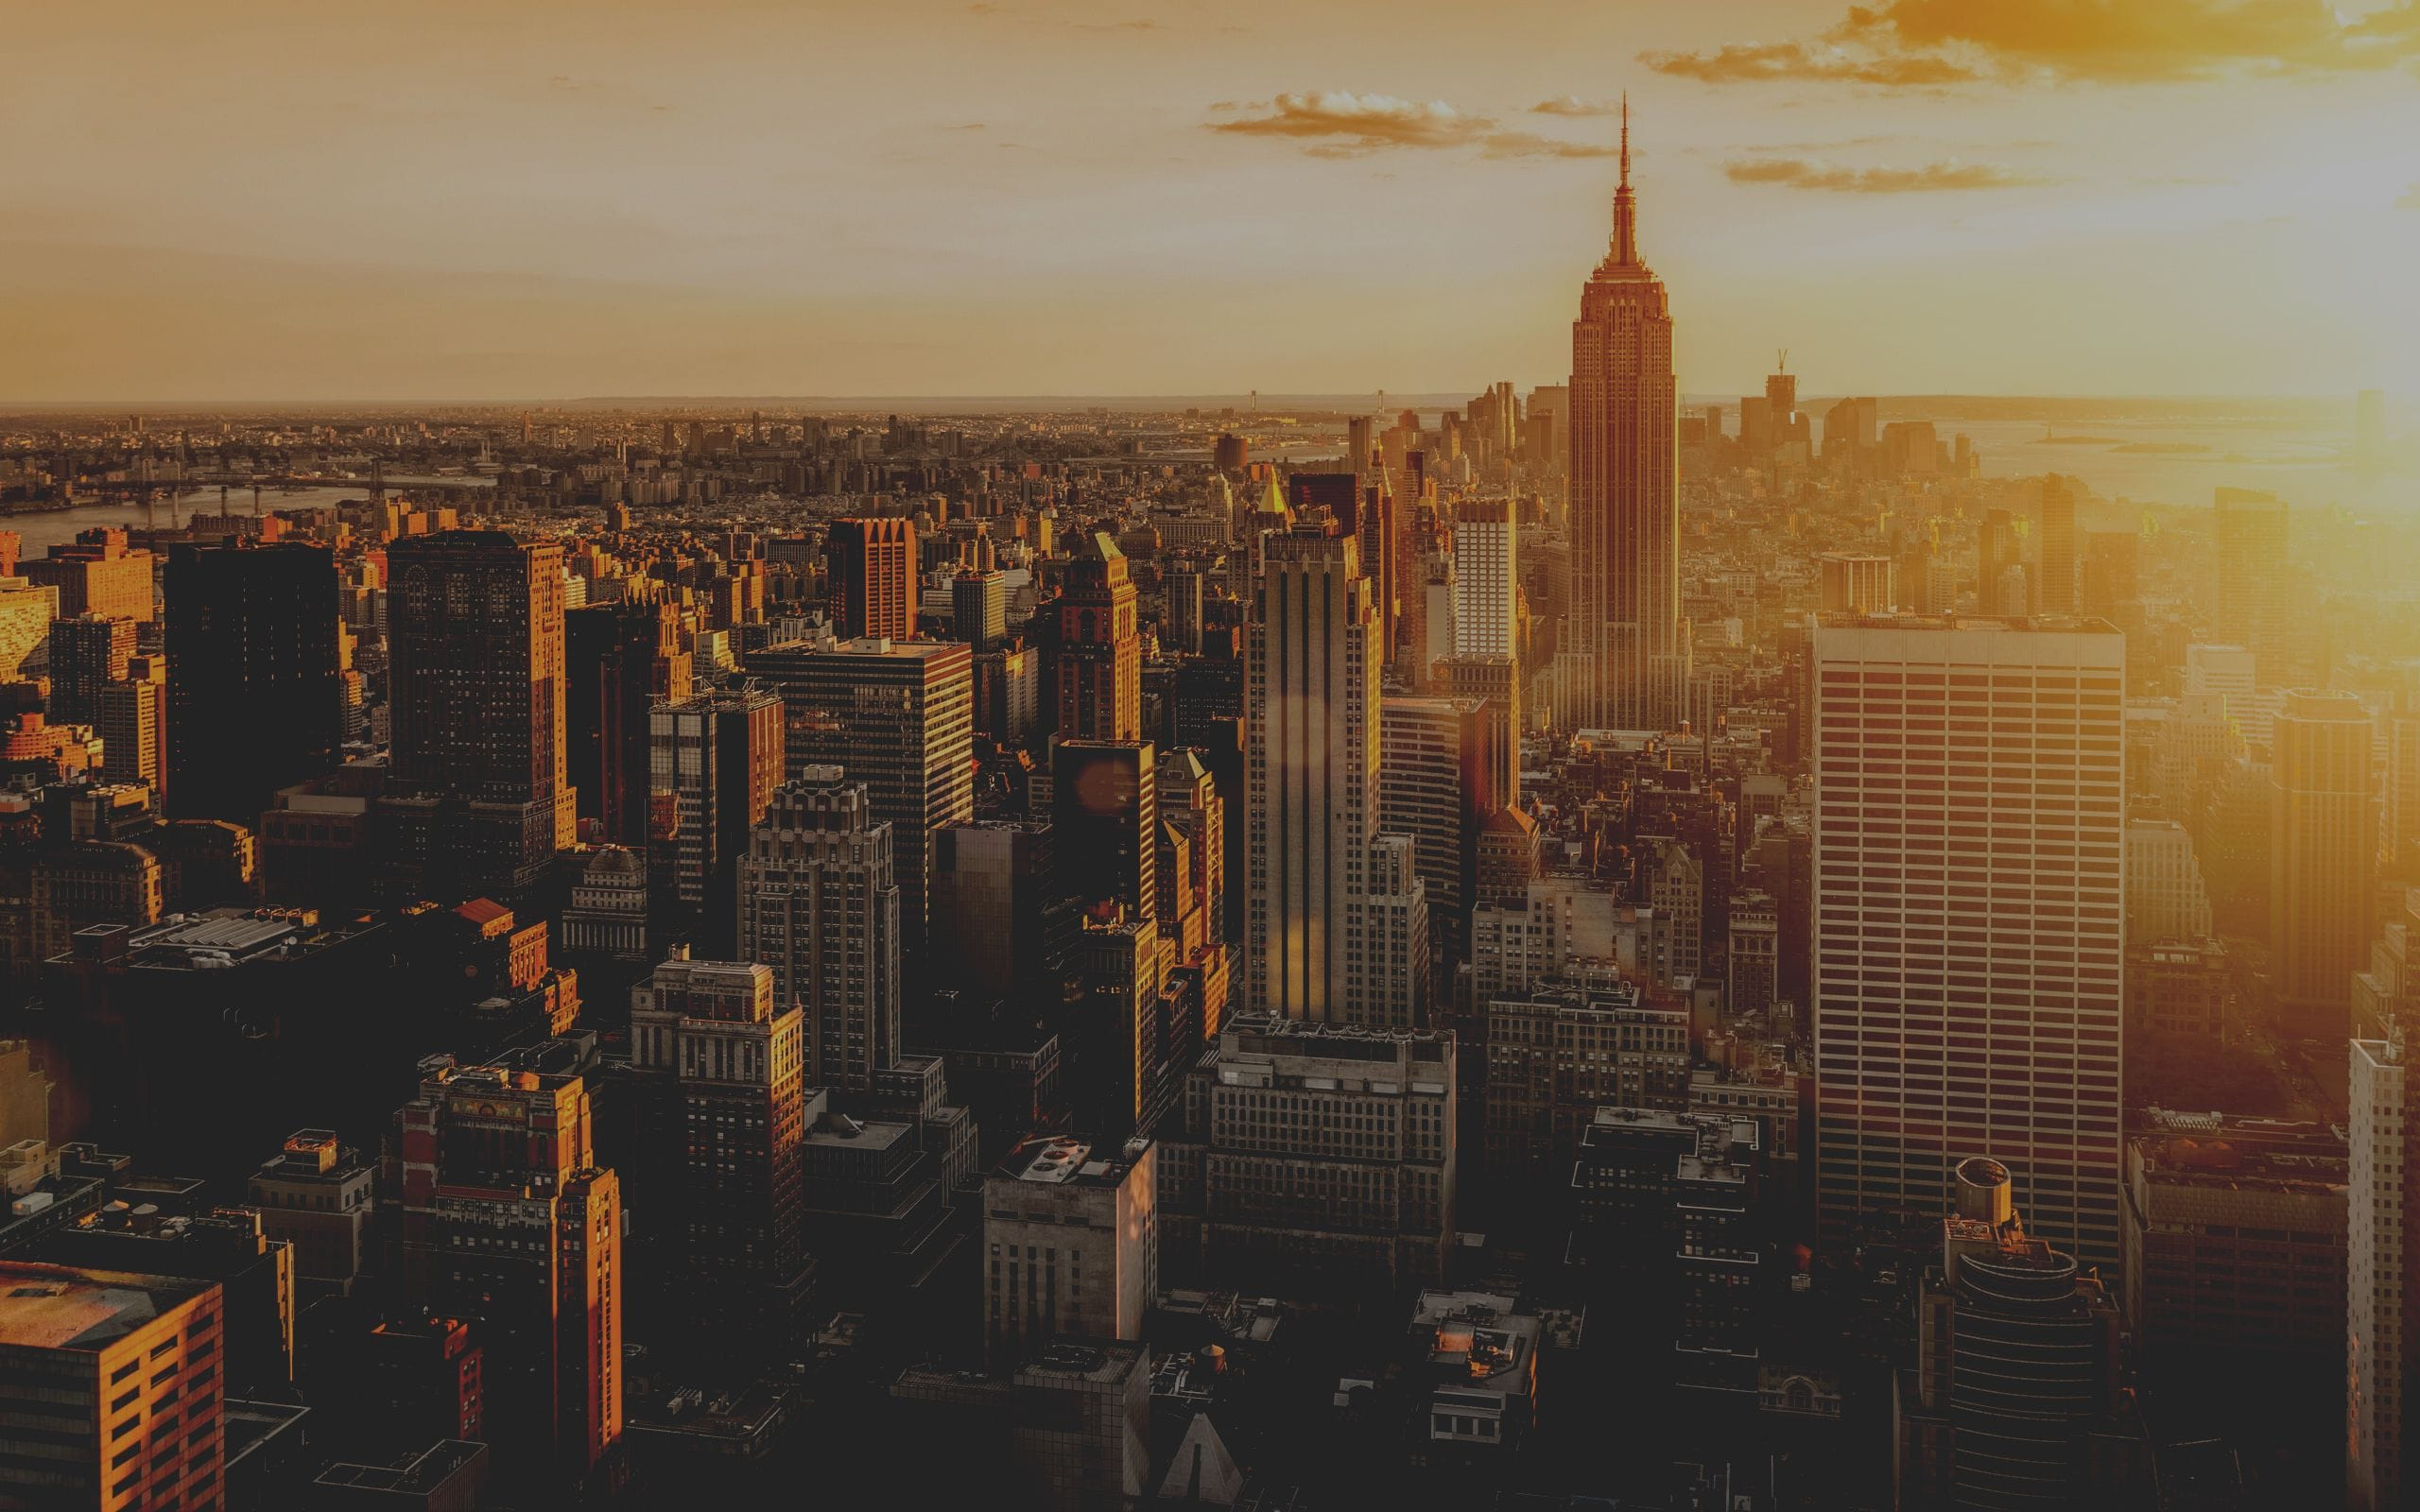 Orishak Capital - Инвестиции в недвижимость за рубежом